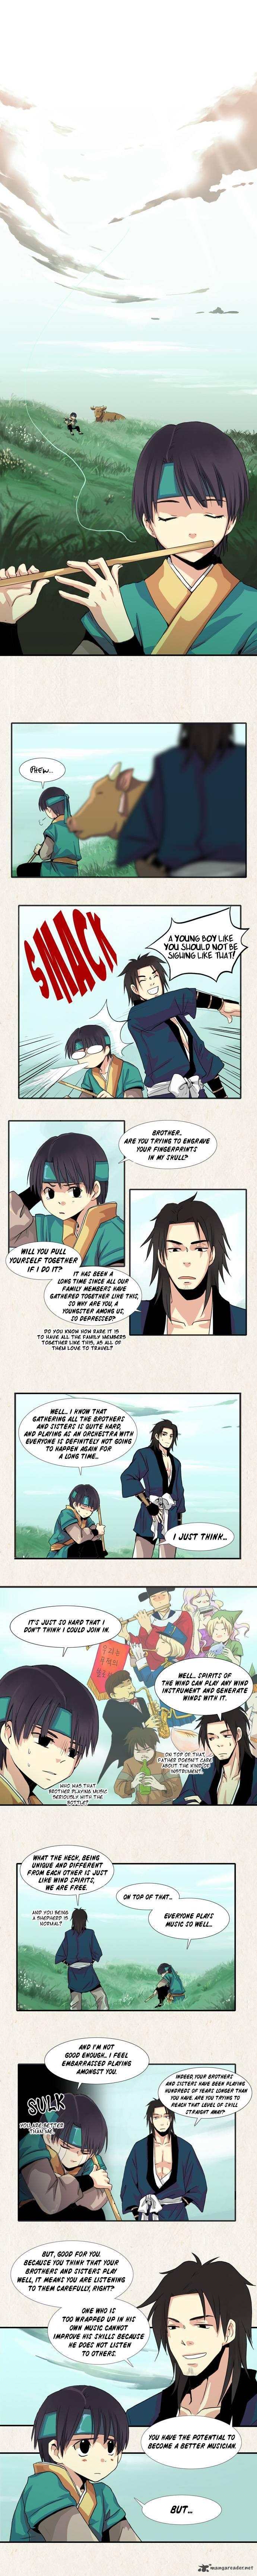 Gyon Woo Jik Nyu 1 Page 2